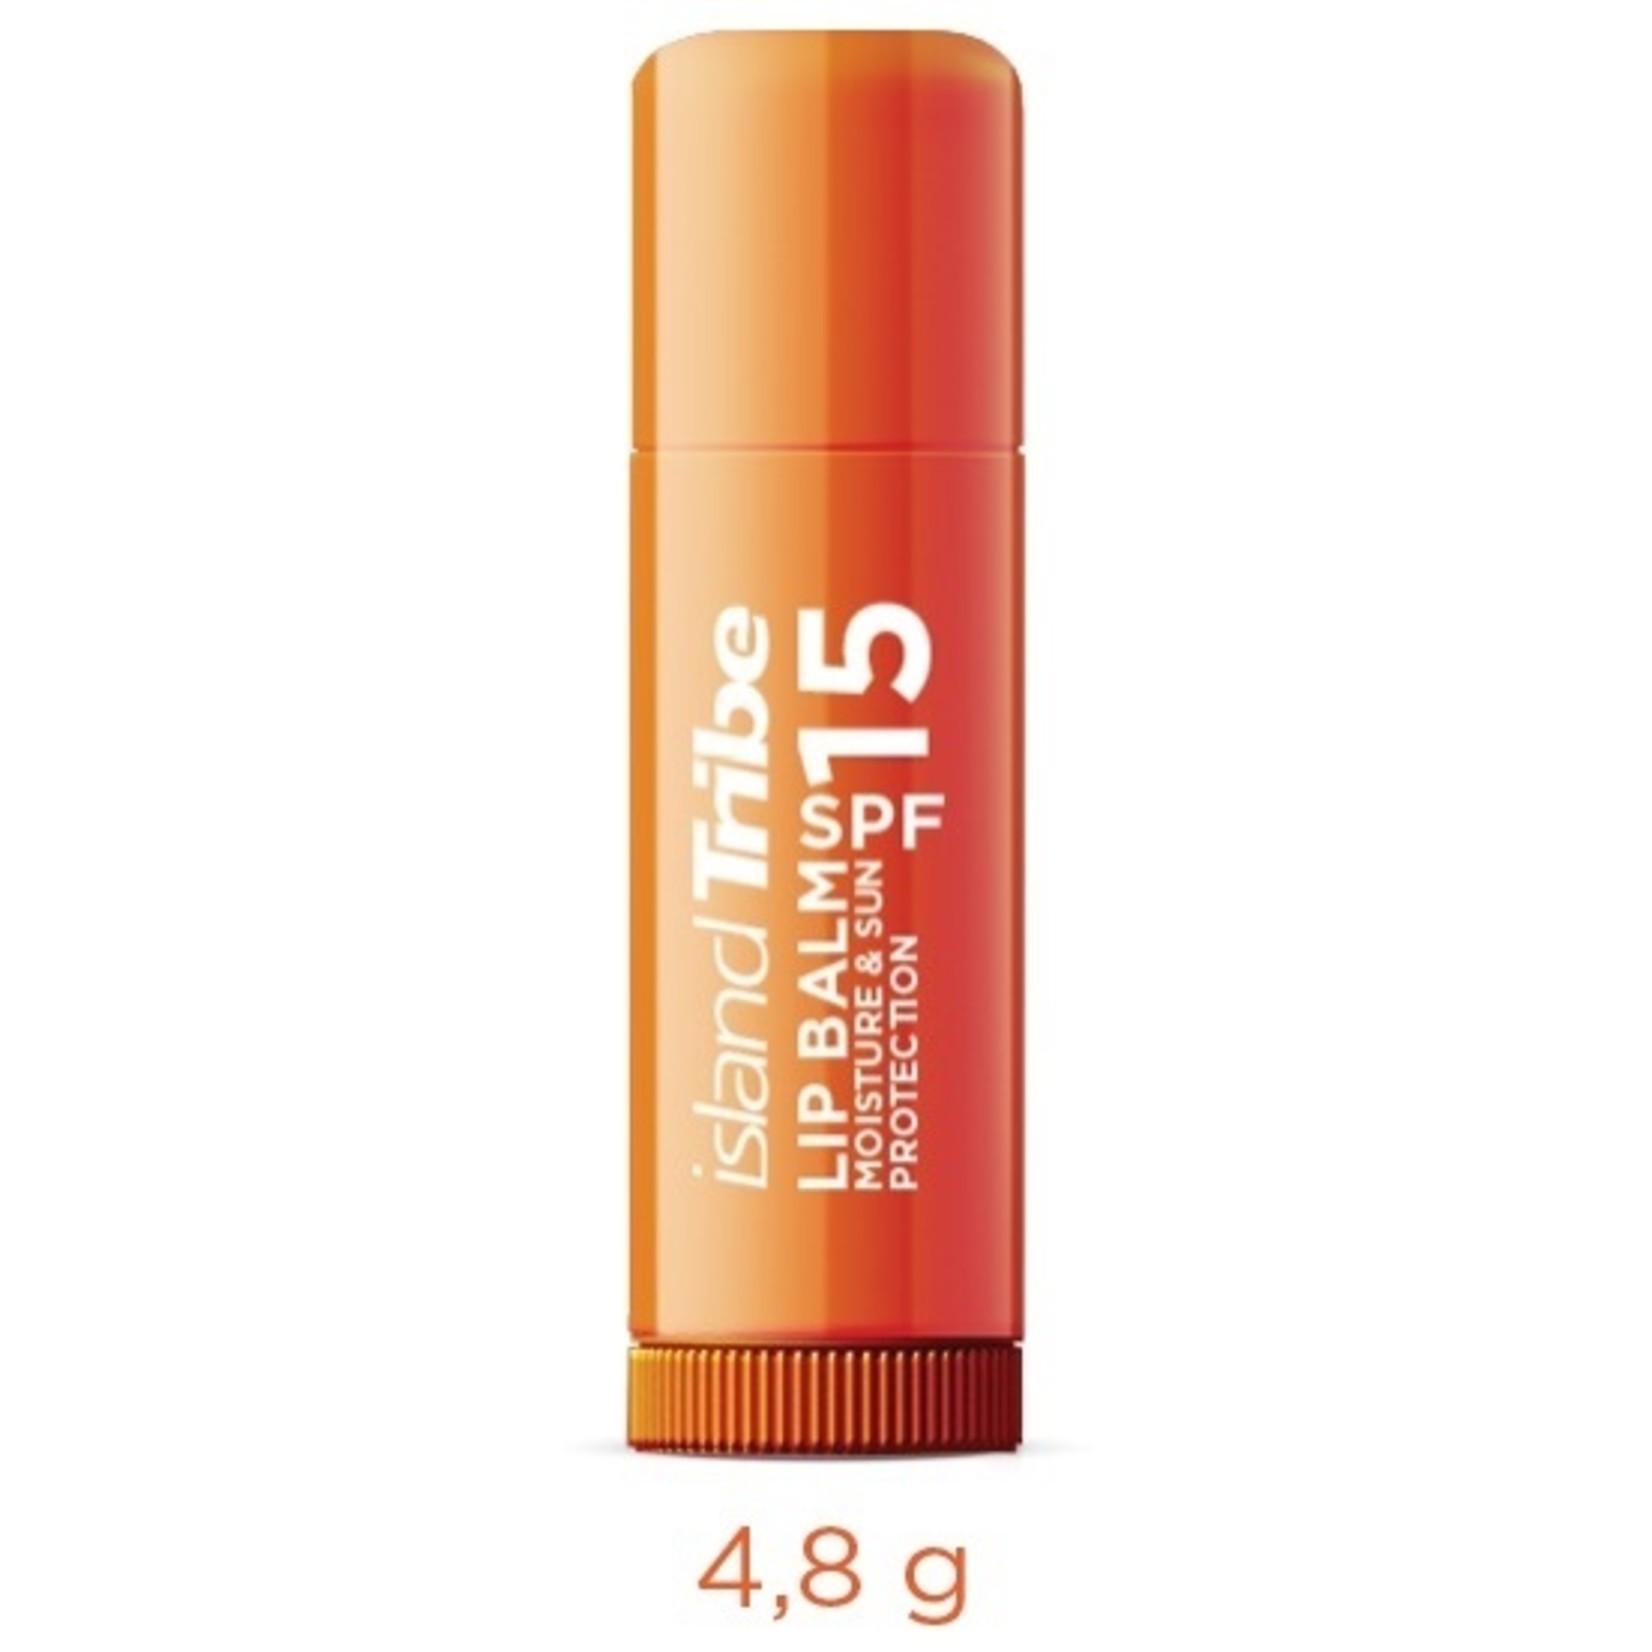 IslandTribe Lip Balm SPF 15